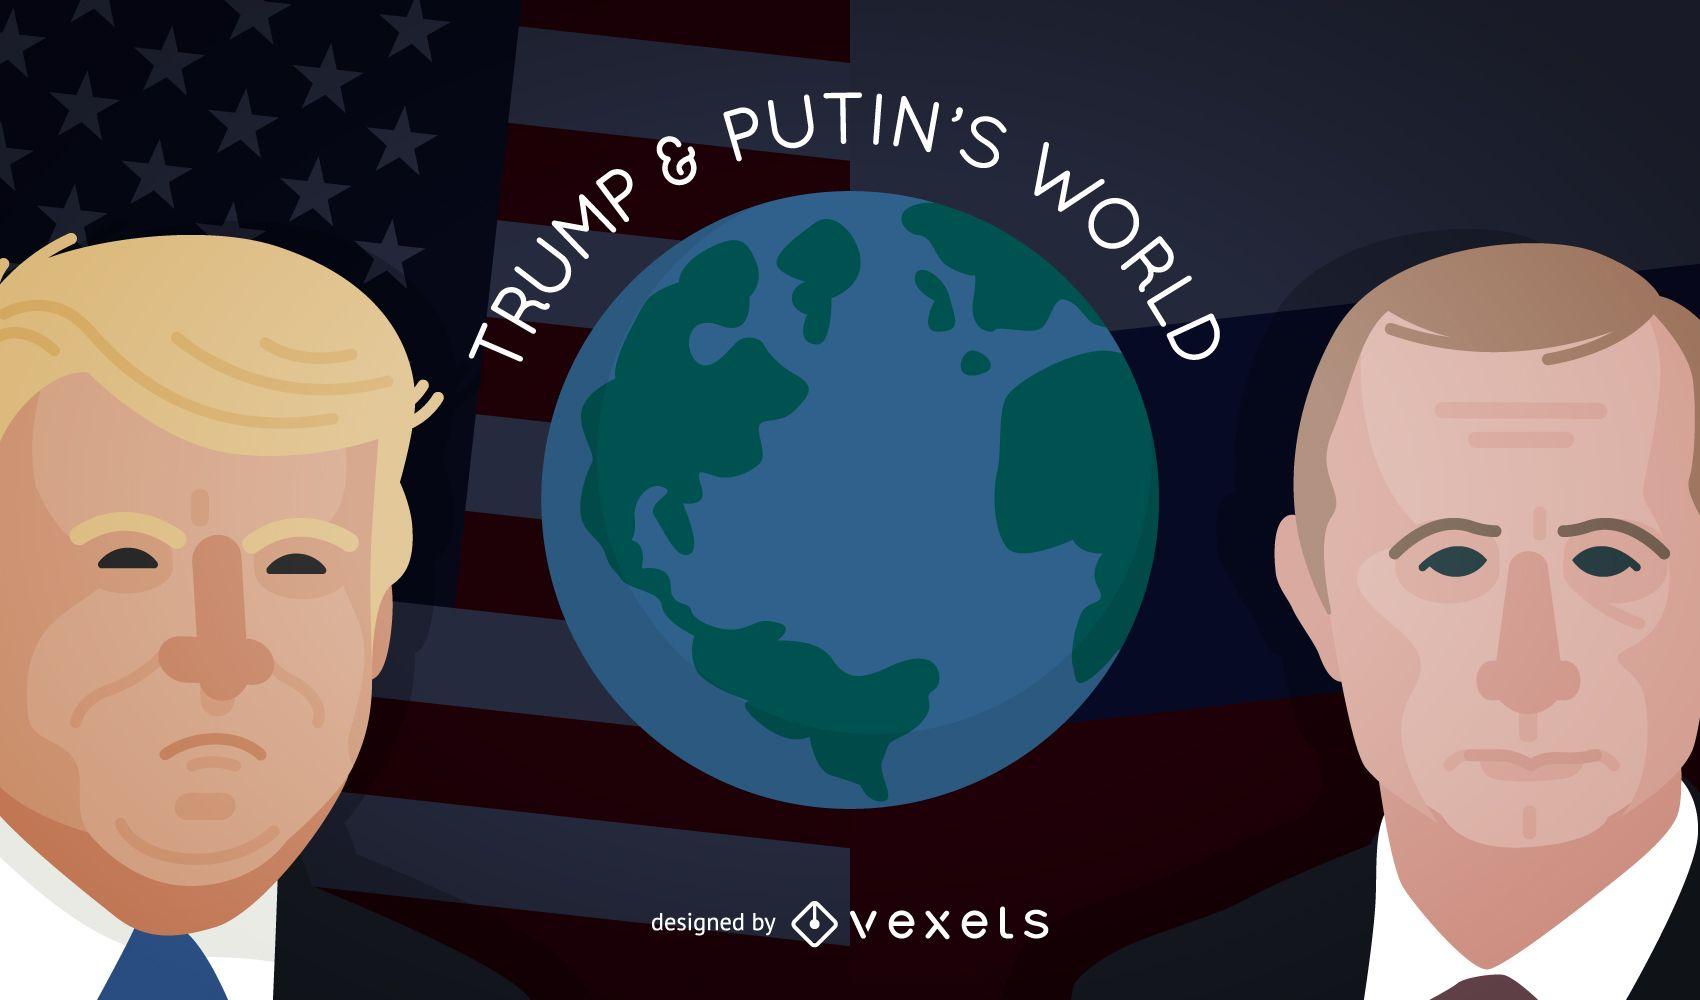 Trump and Putin on the world